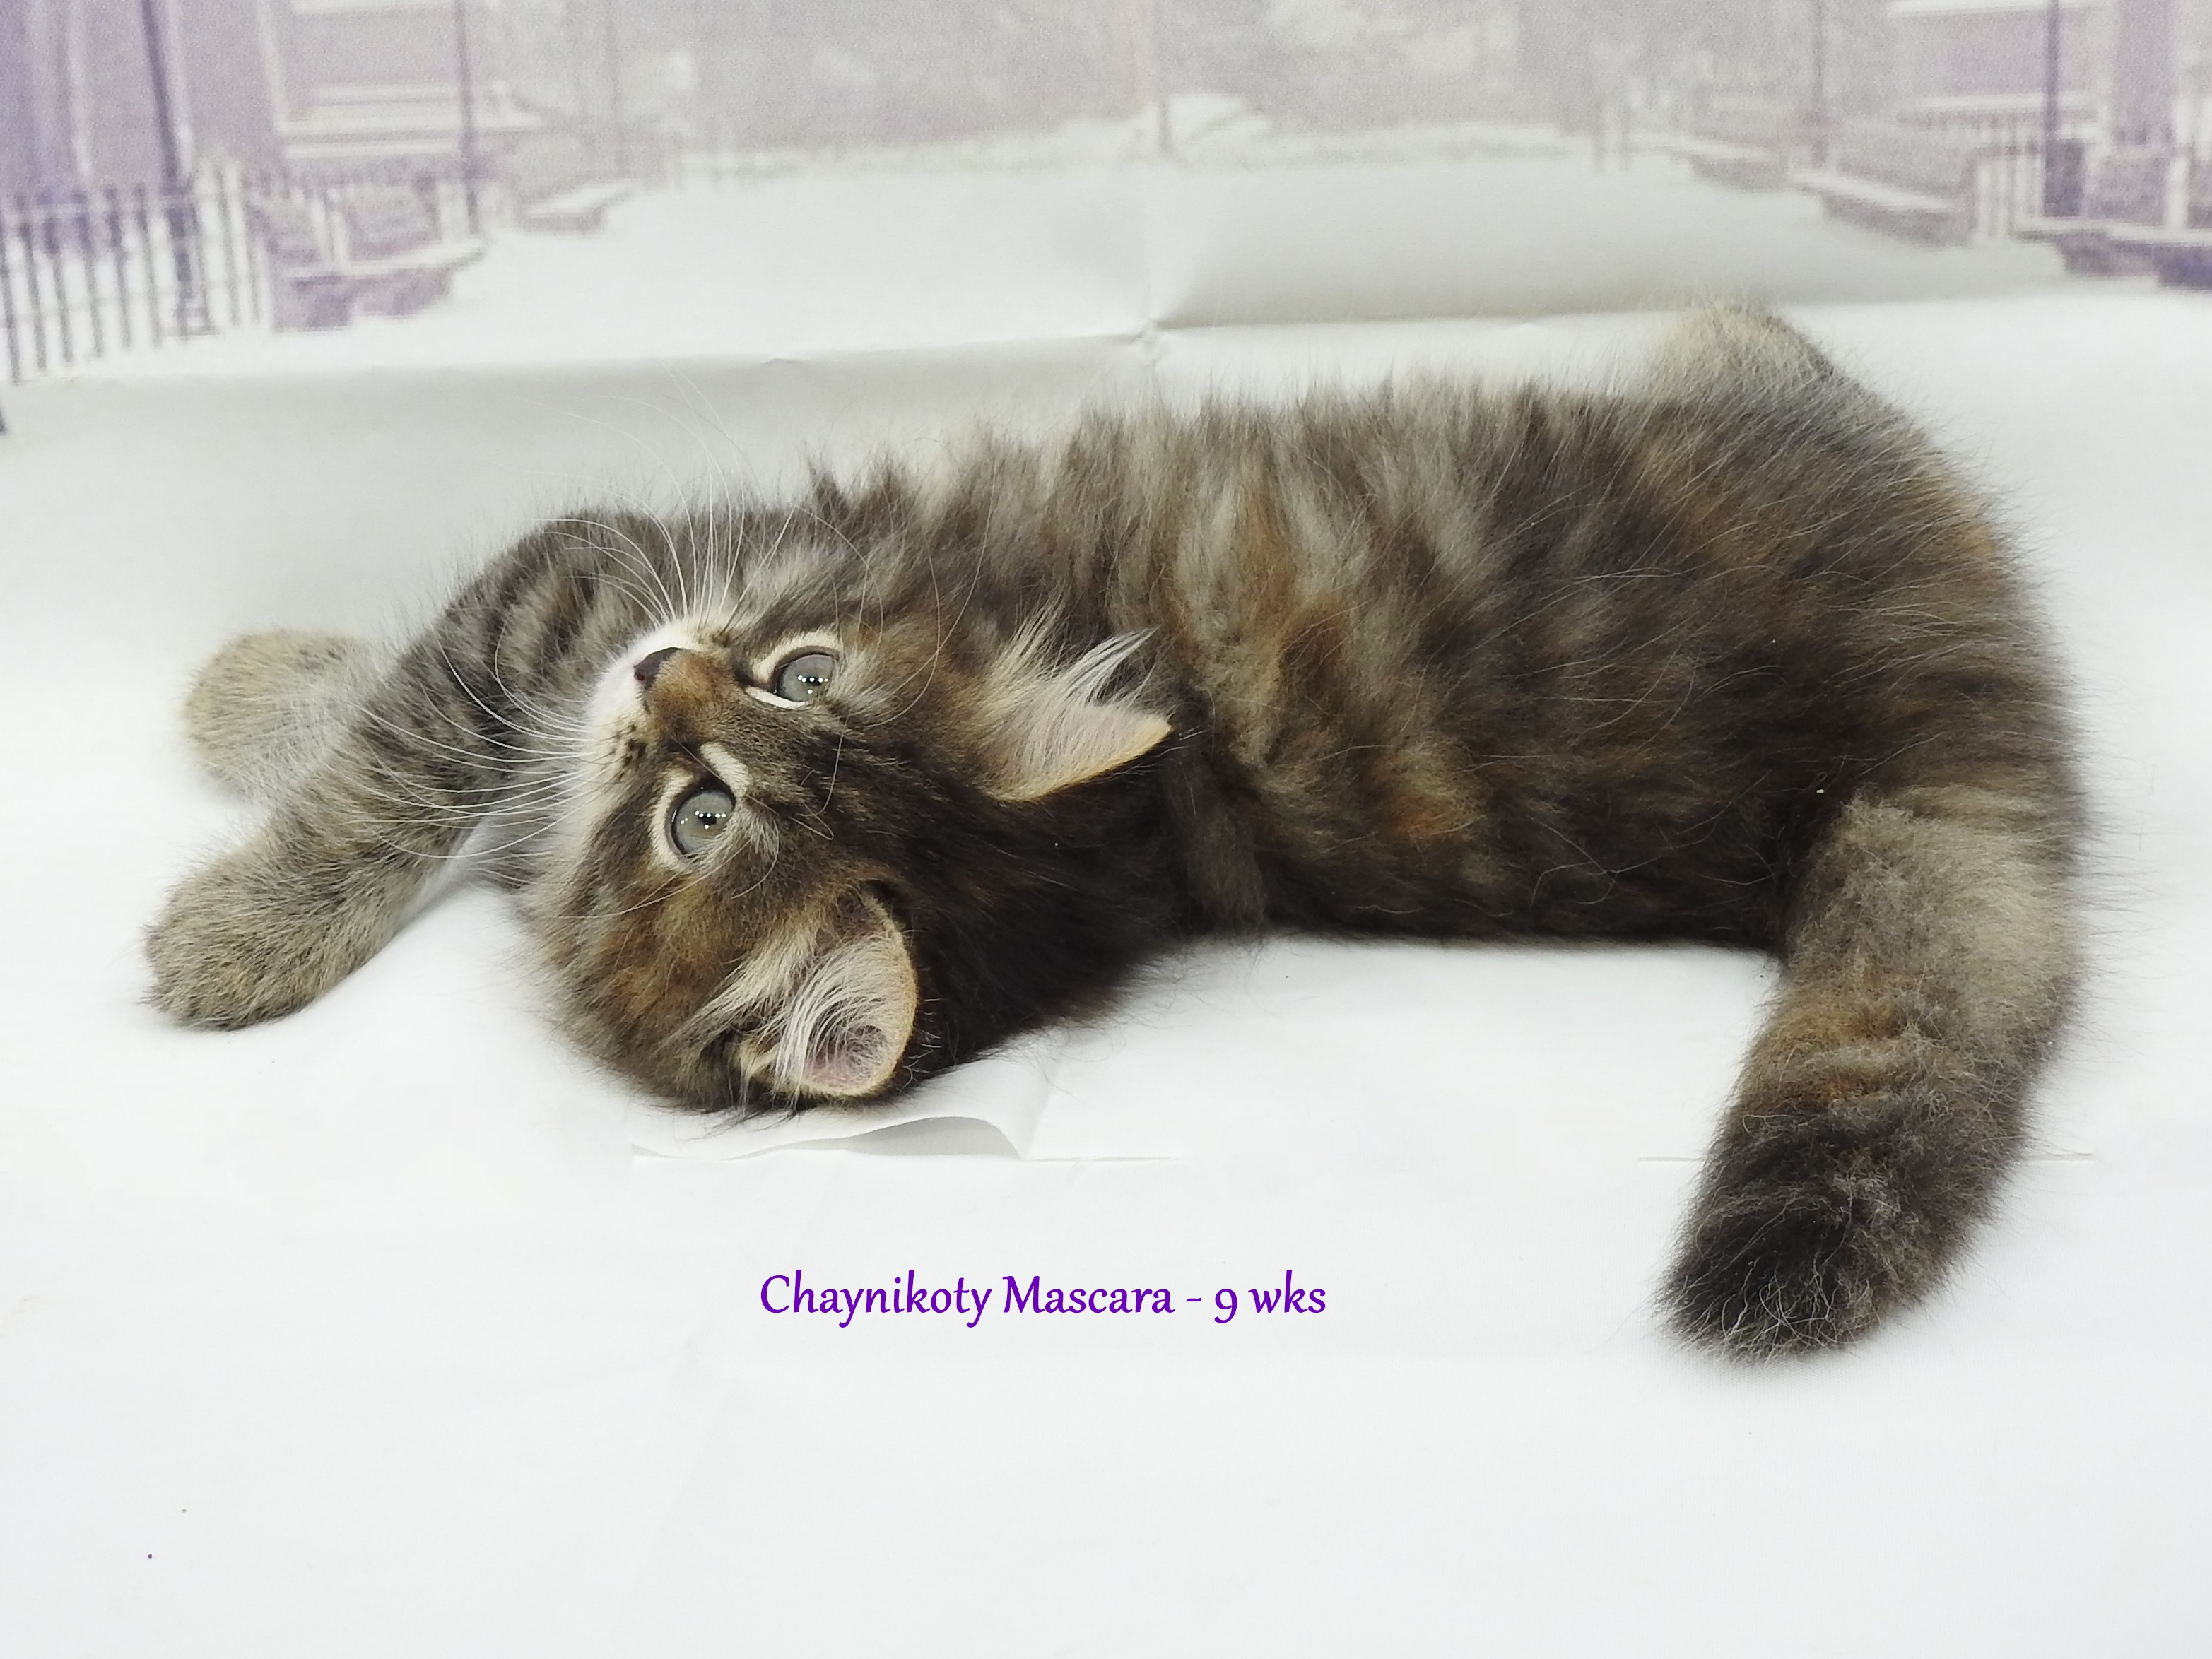 Chaynikoty Mascara - 9wks